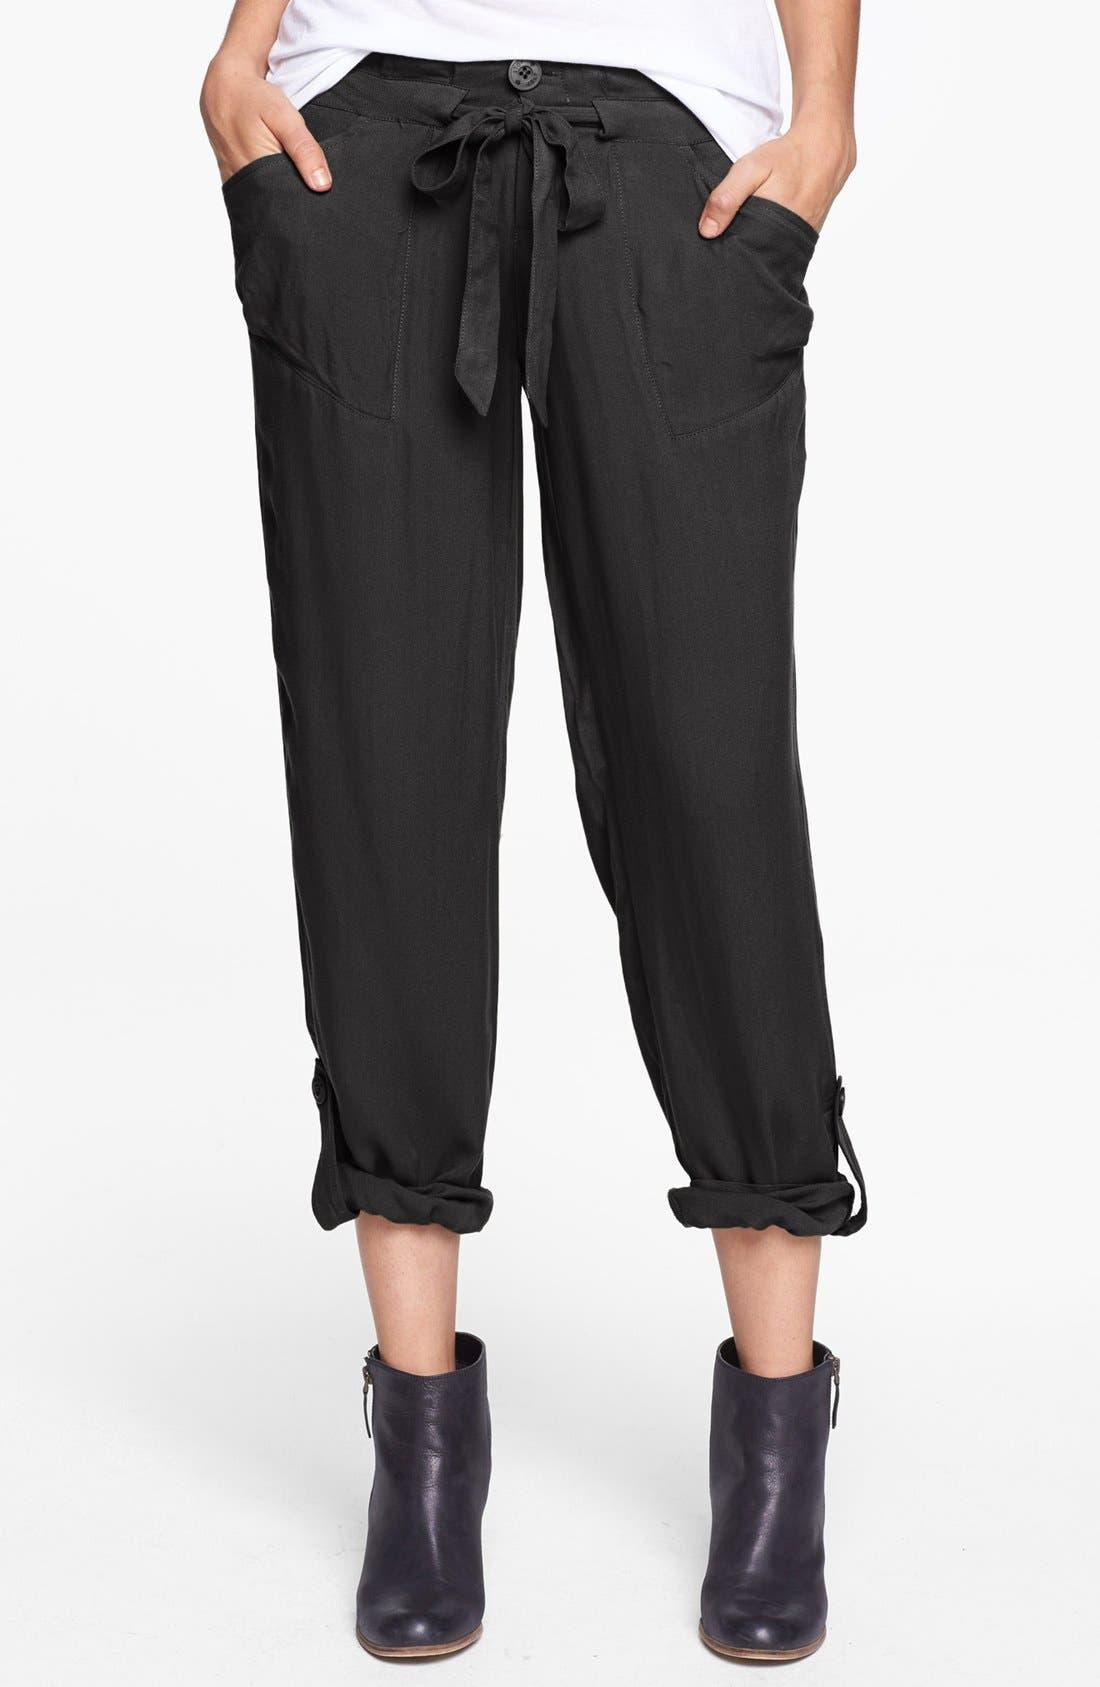 JOLT Drawstring Woven Pants, Main, color, 001